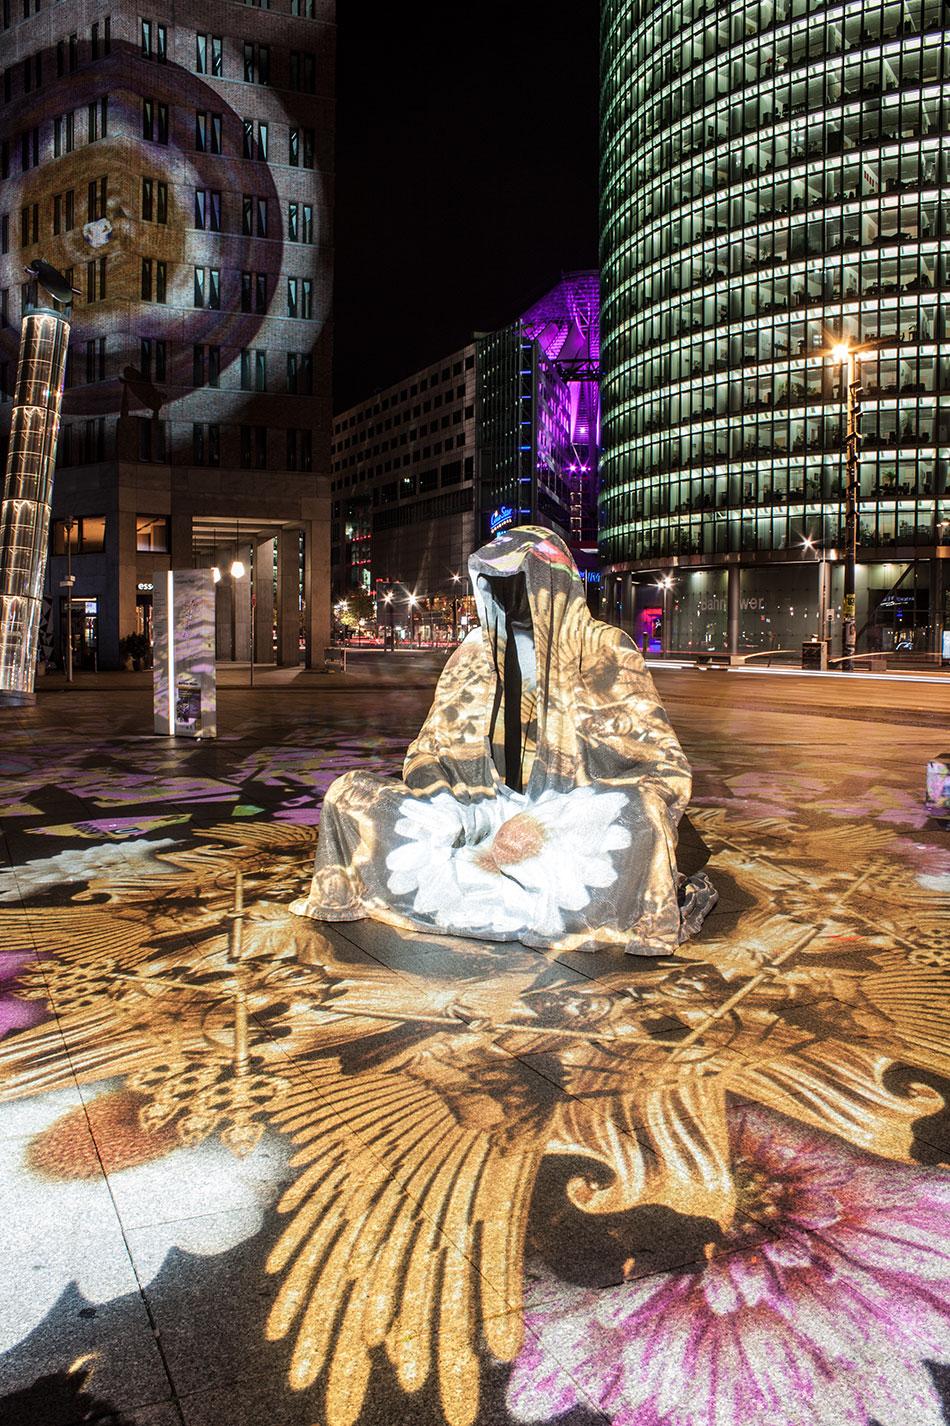 festival-of-lights-berlin-potzdamer-platz-light-art-show-exhibition-lumina-guardians-of-time-manfred-kili-kielnhofer-contemporary-arts-design-large-scale-monumental-public-sculpture-3544